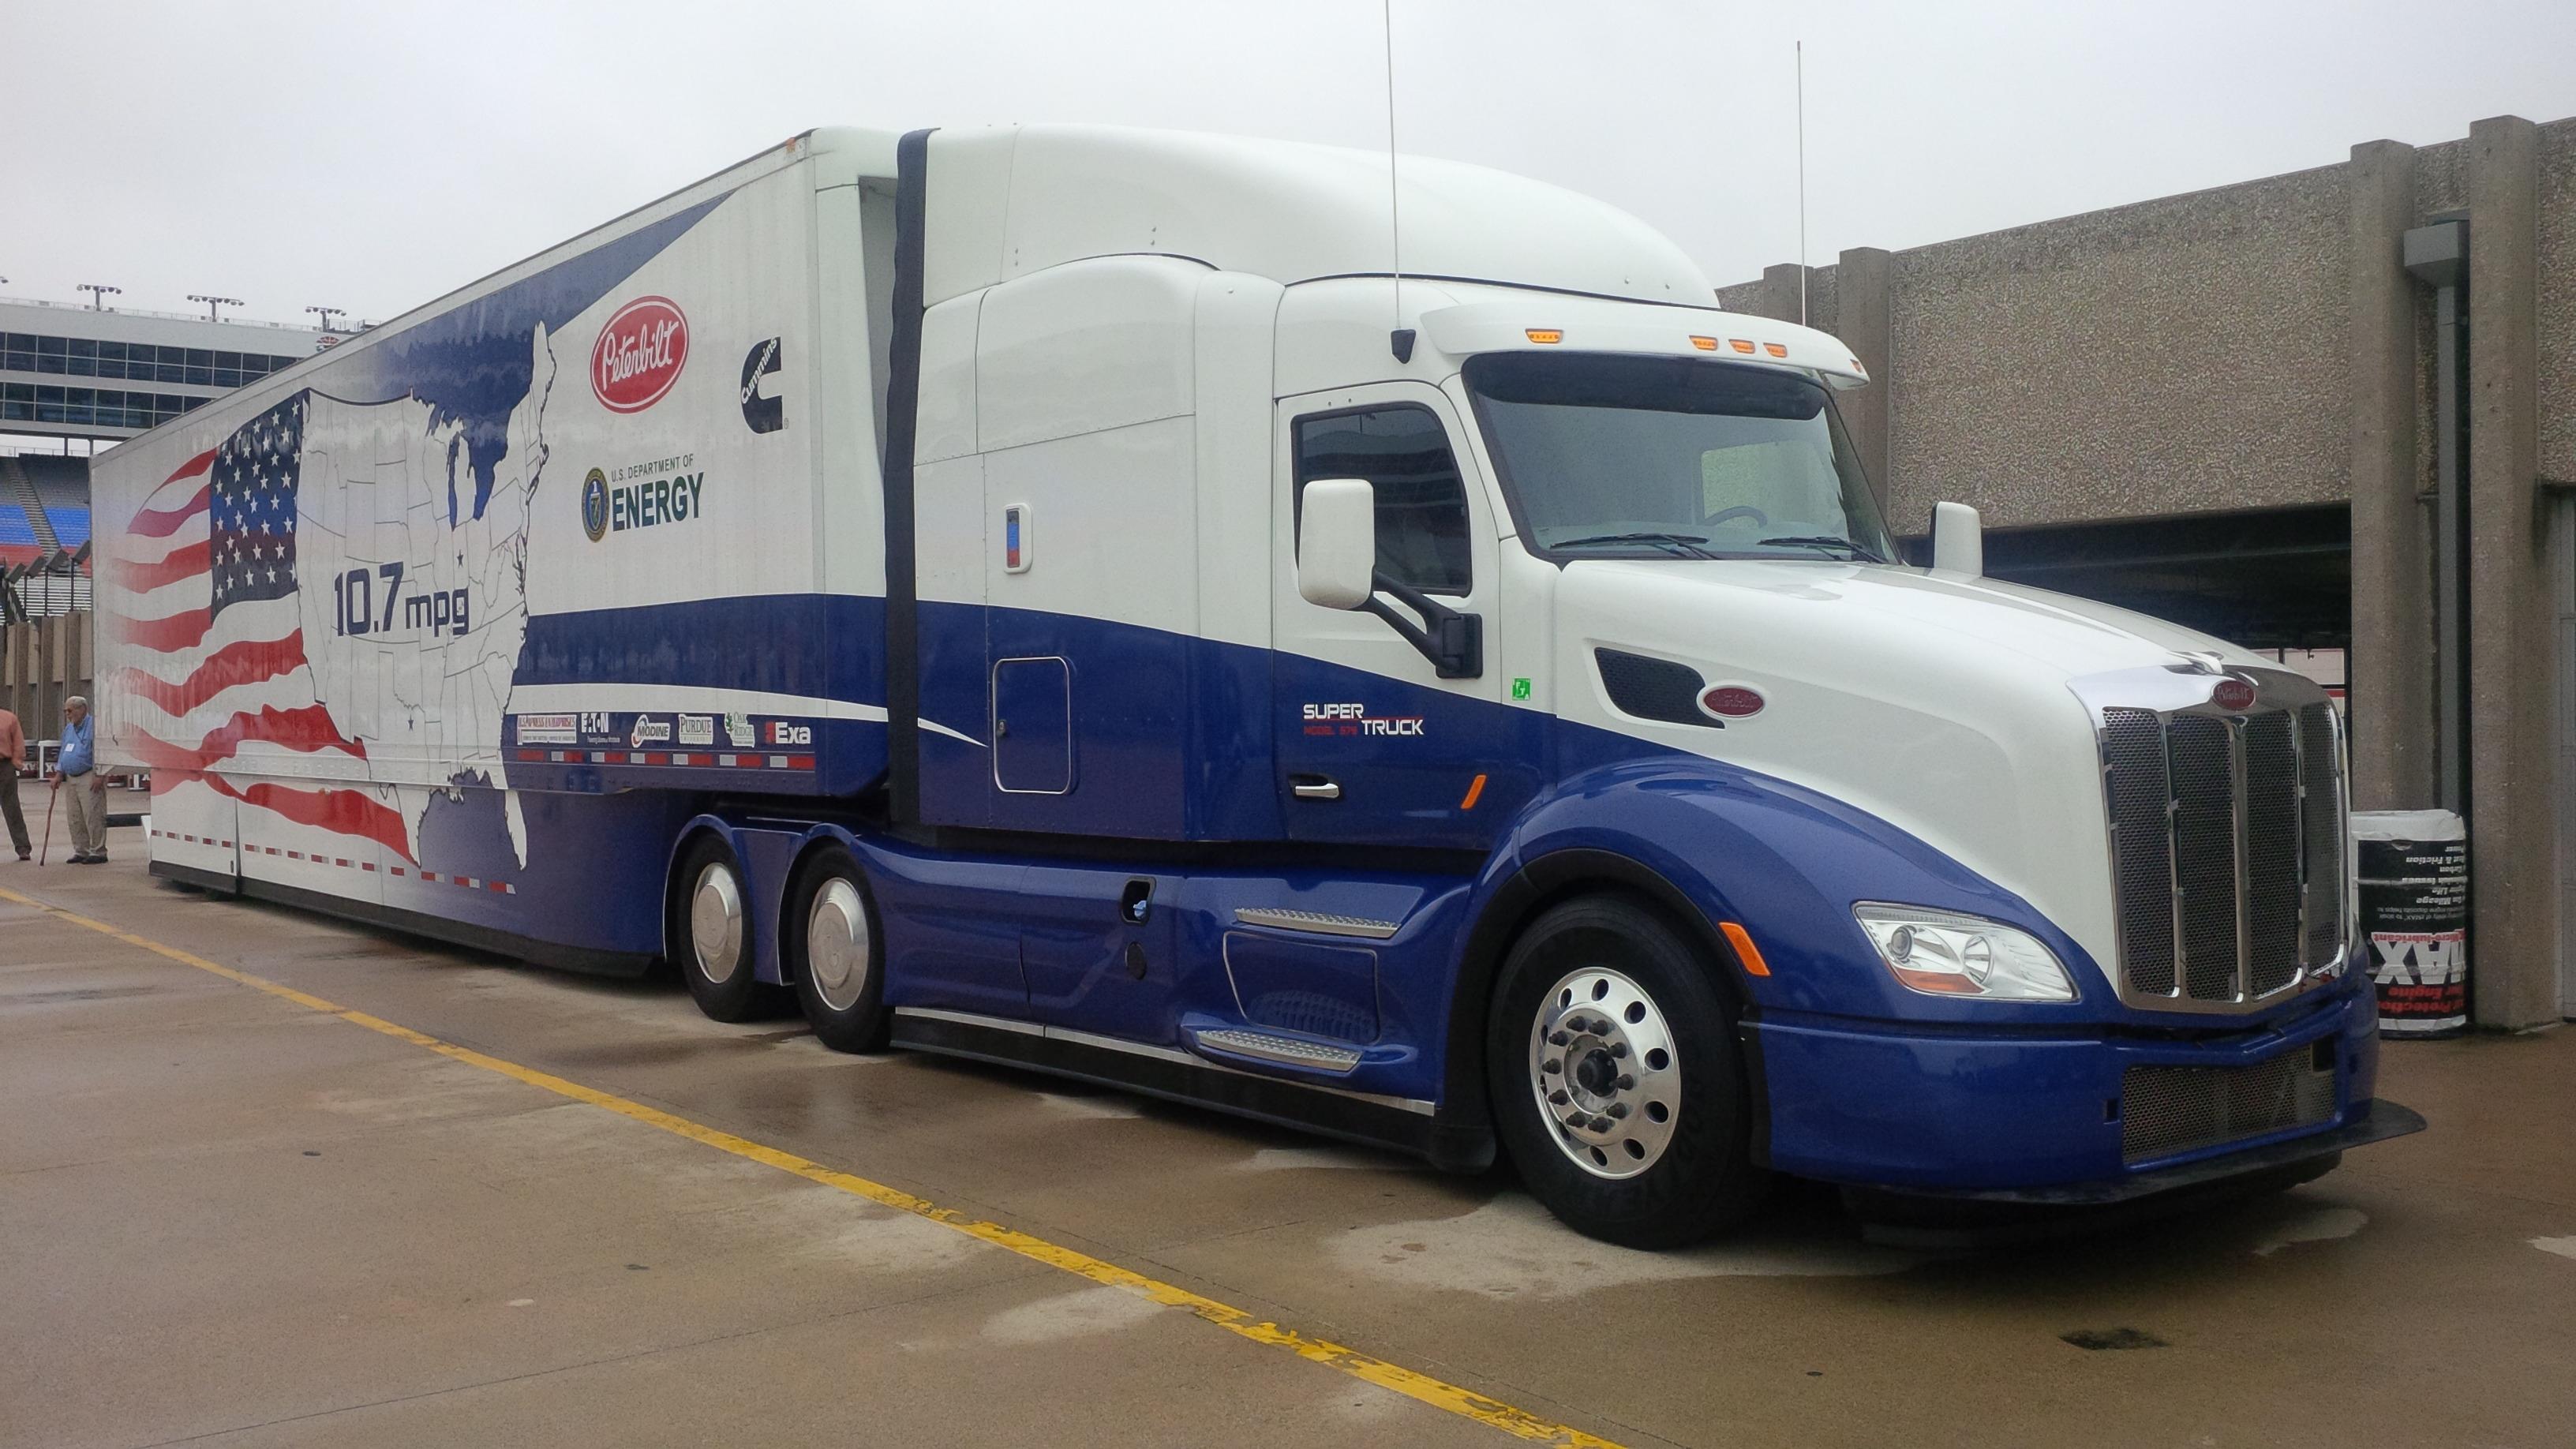 Truck Cab Inside >> Peterbilt showcases latest technologies - Truck News